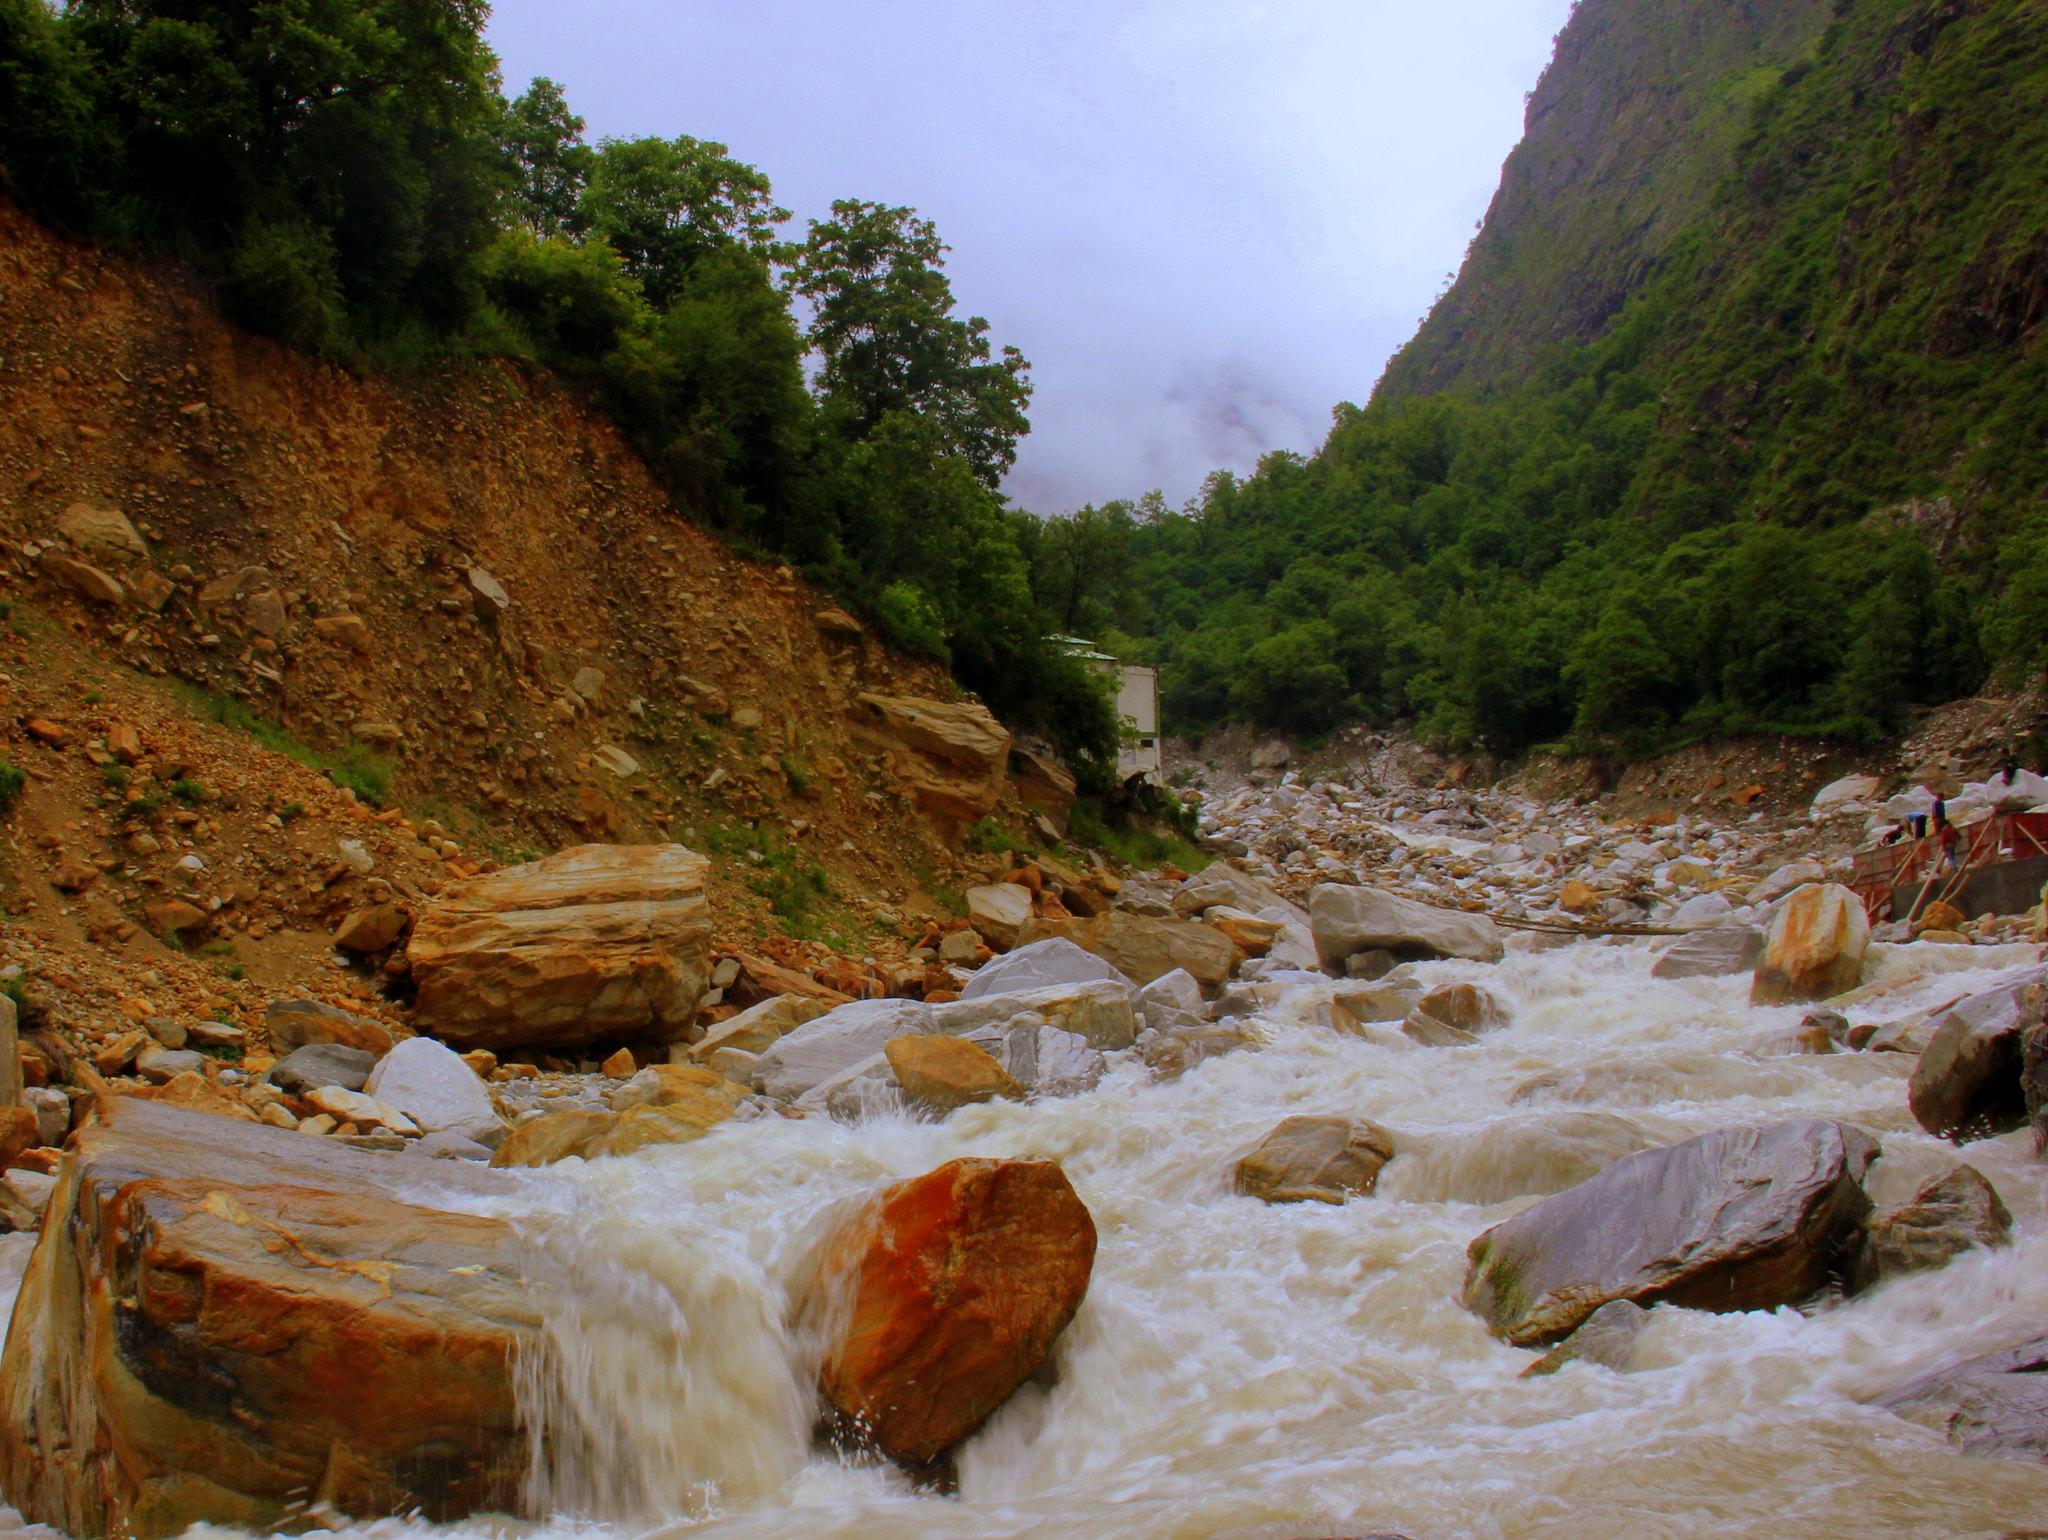 You have to cross laxman ganga river for reaching ghangaria